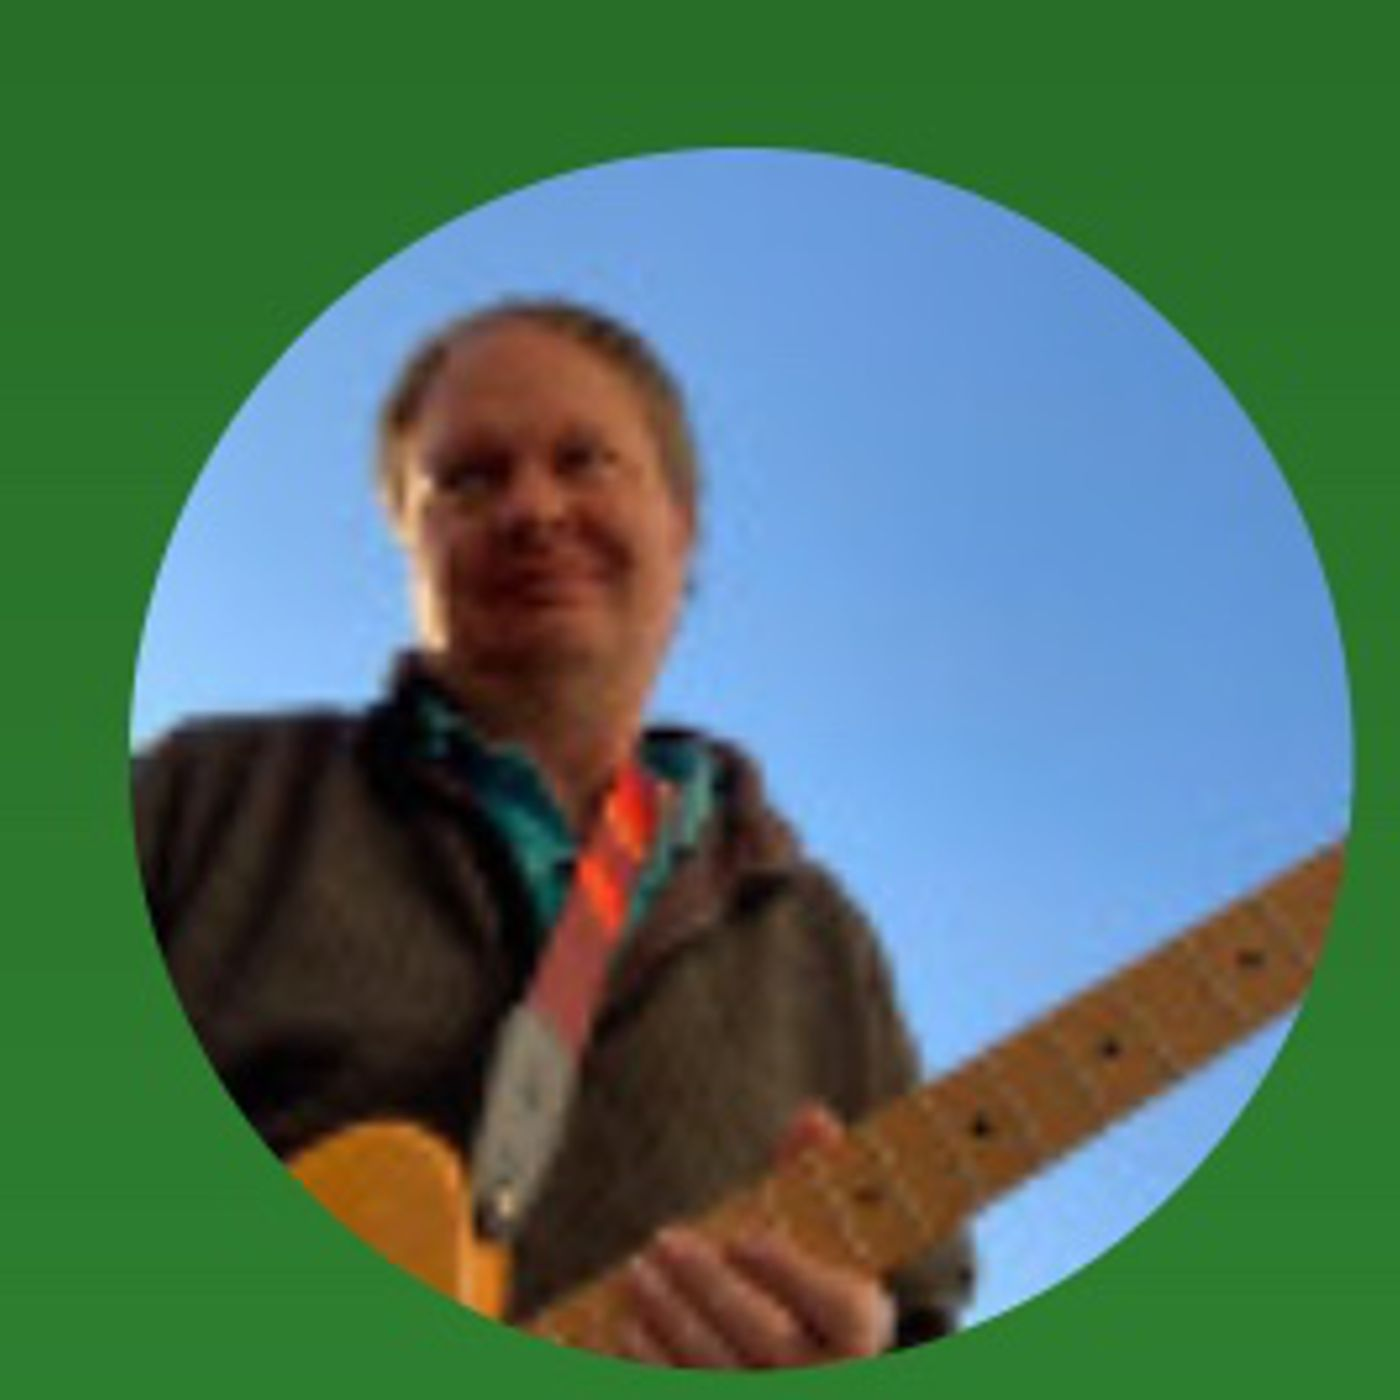 Admiral Bob_Free Music and Free Bear - 10:3:20, 9.34 PM